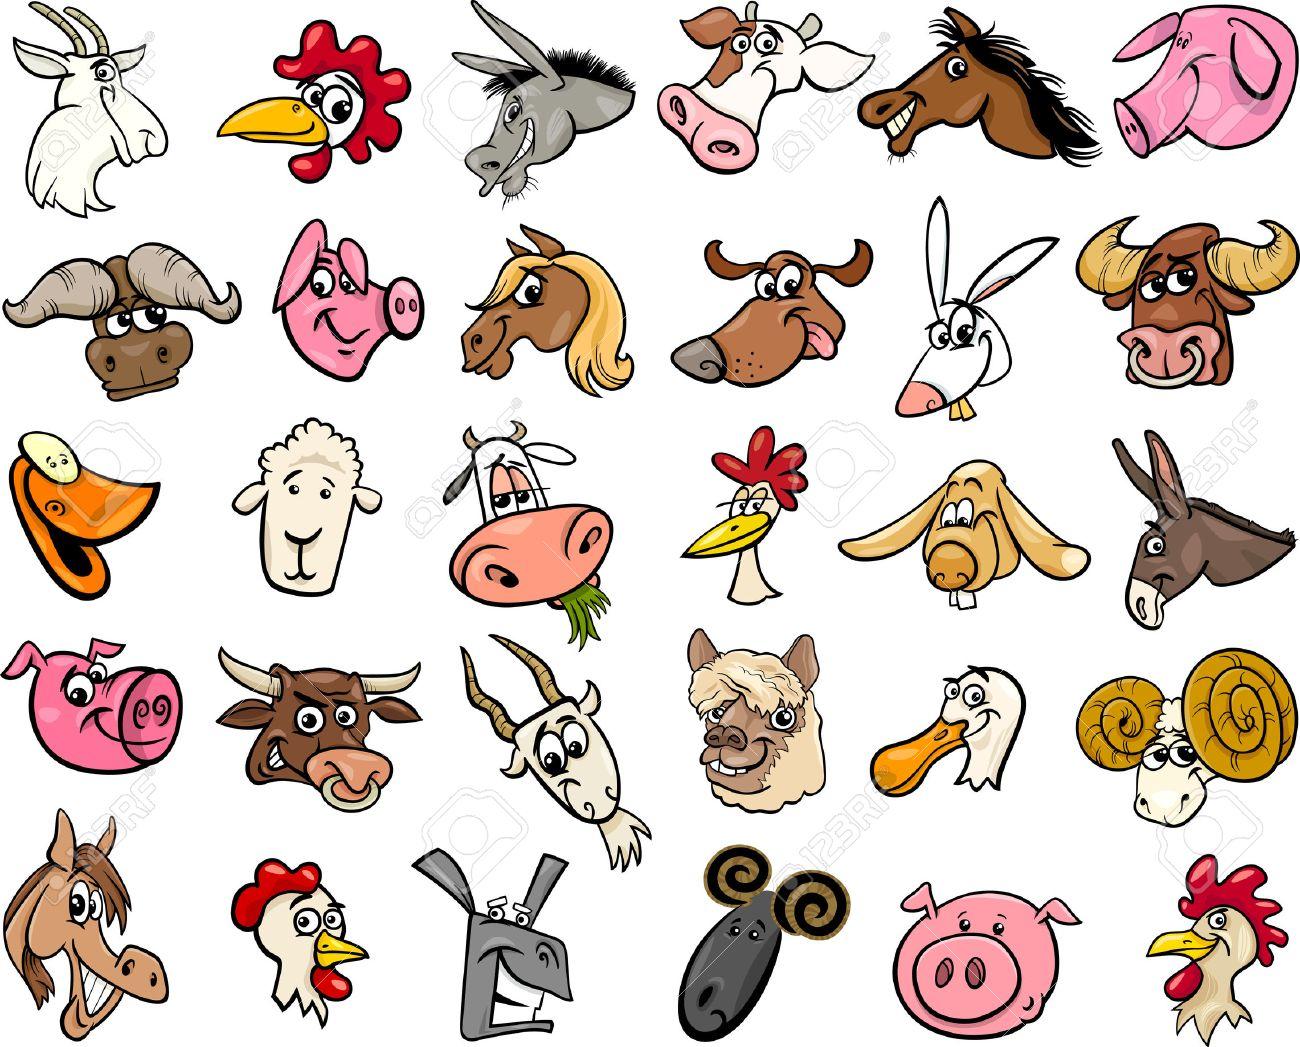 Cartoon Illustration of Funny Farm Animals Heads Big Set Stock Vector - 41029371